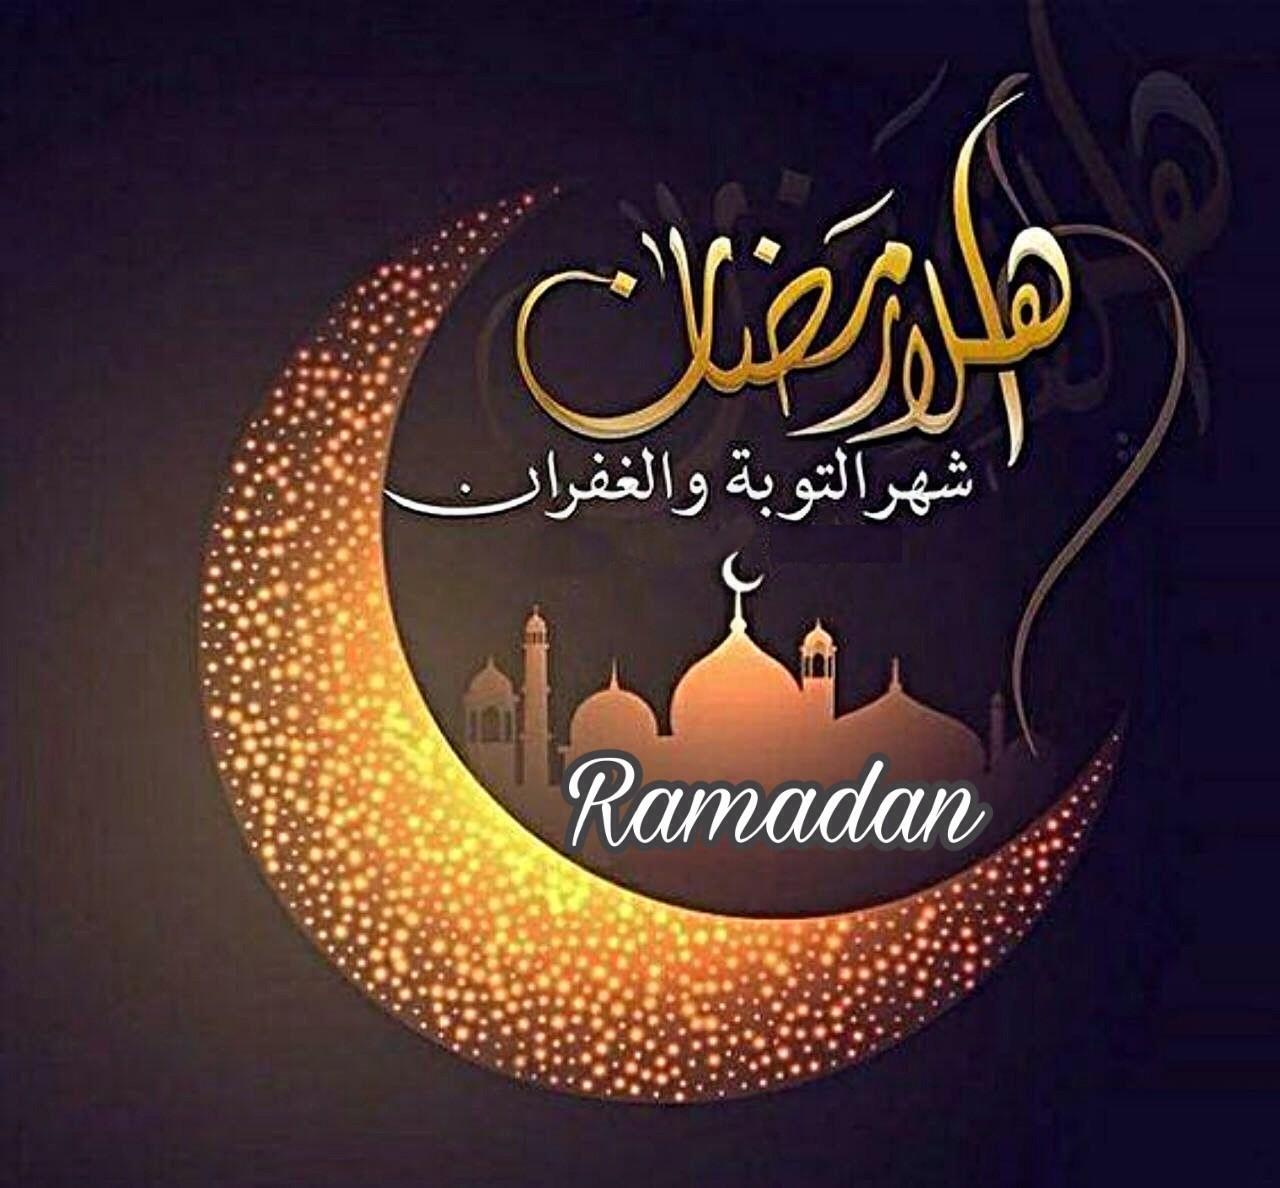 رمضان1.jpg